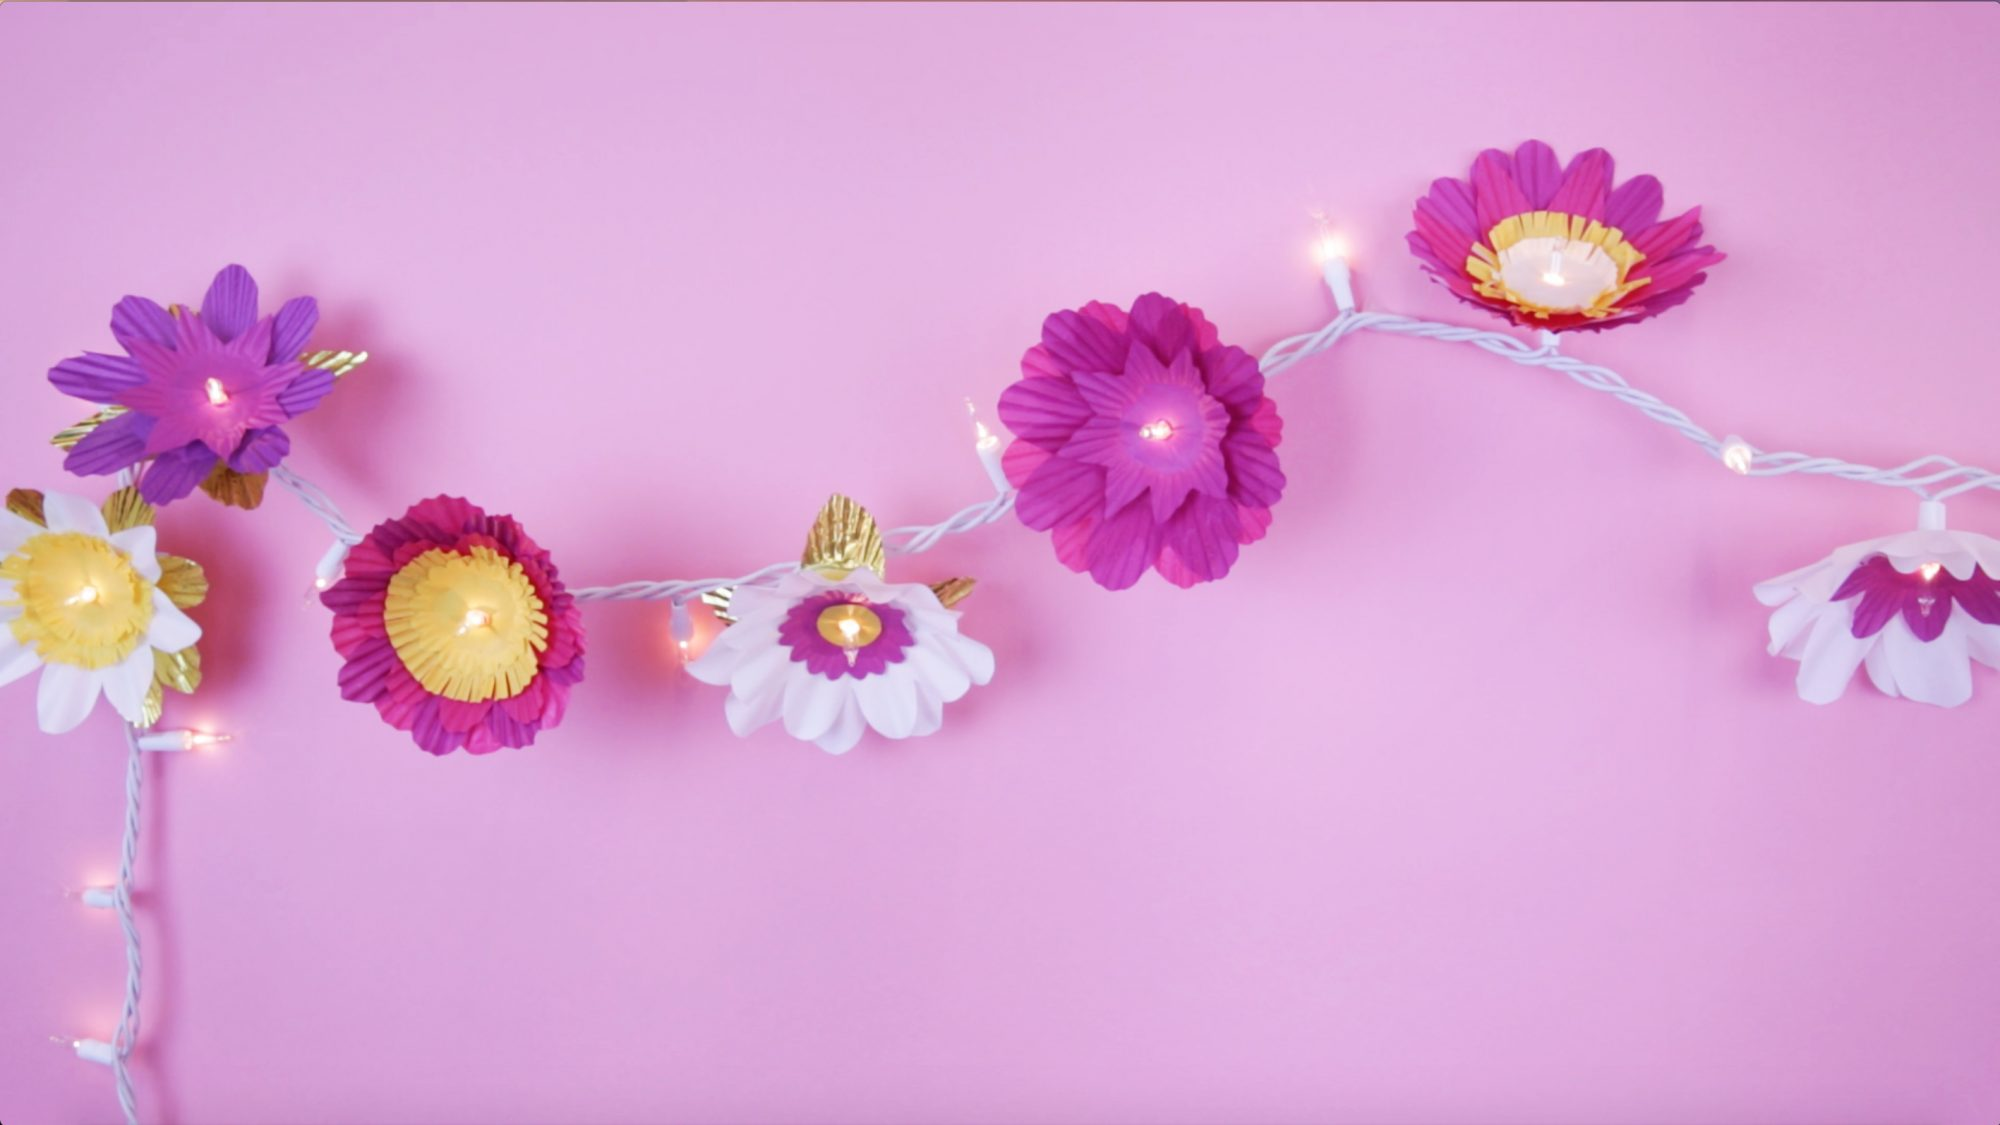 DIY Cupcake Flower Lights